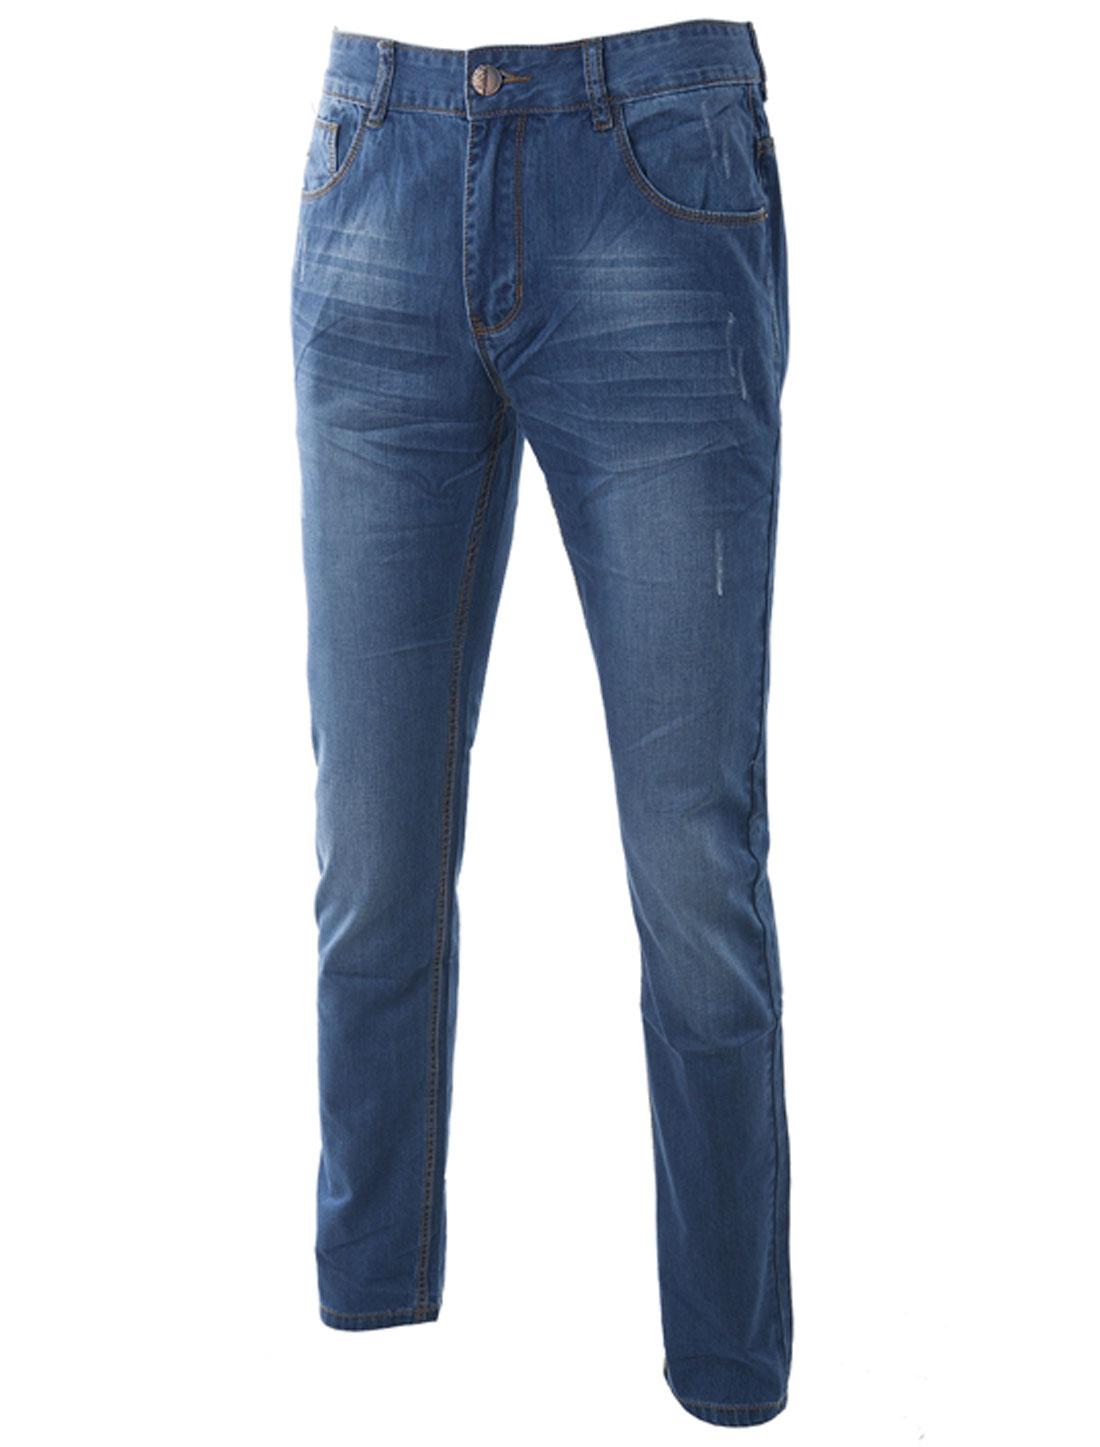 Men's Mid Rise Zip Fly Single Button Closure Denim Pants Dark Blue W34